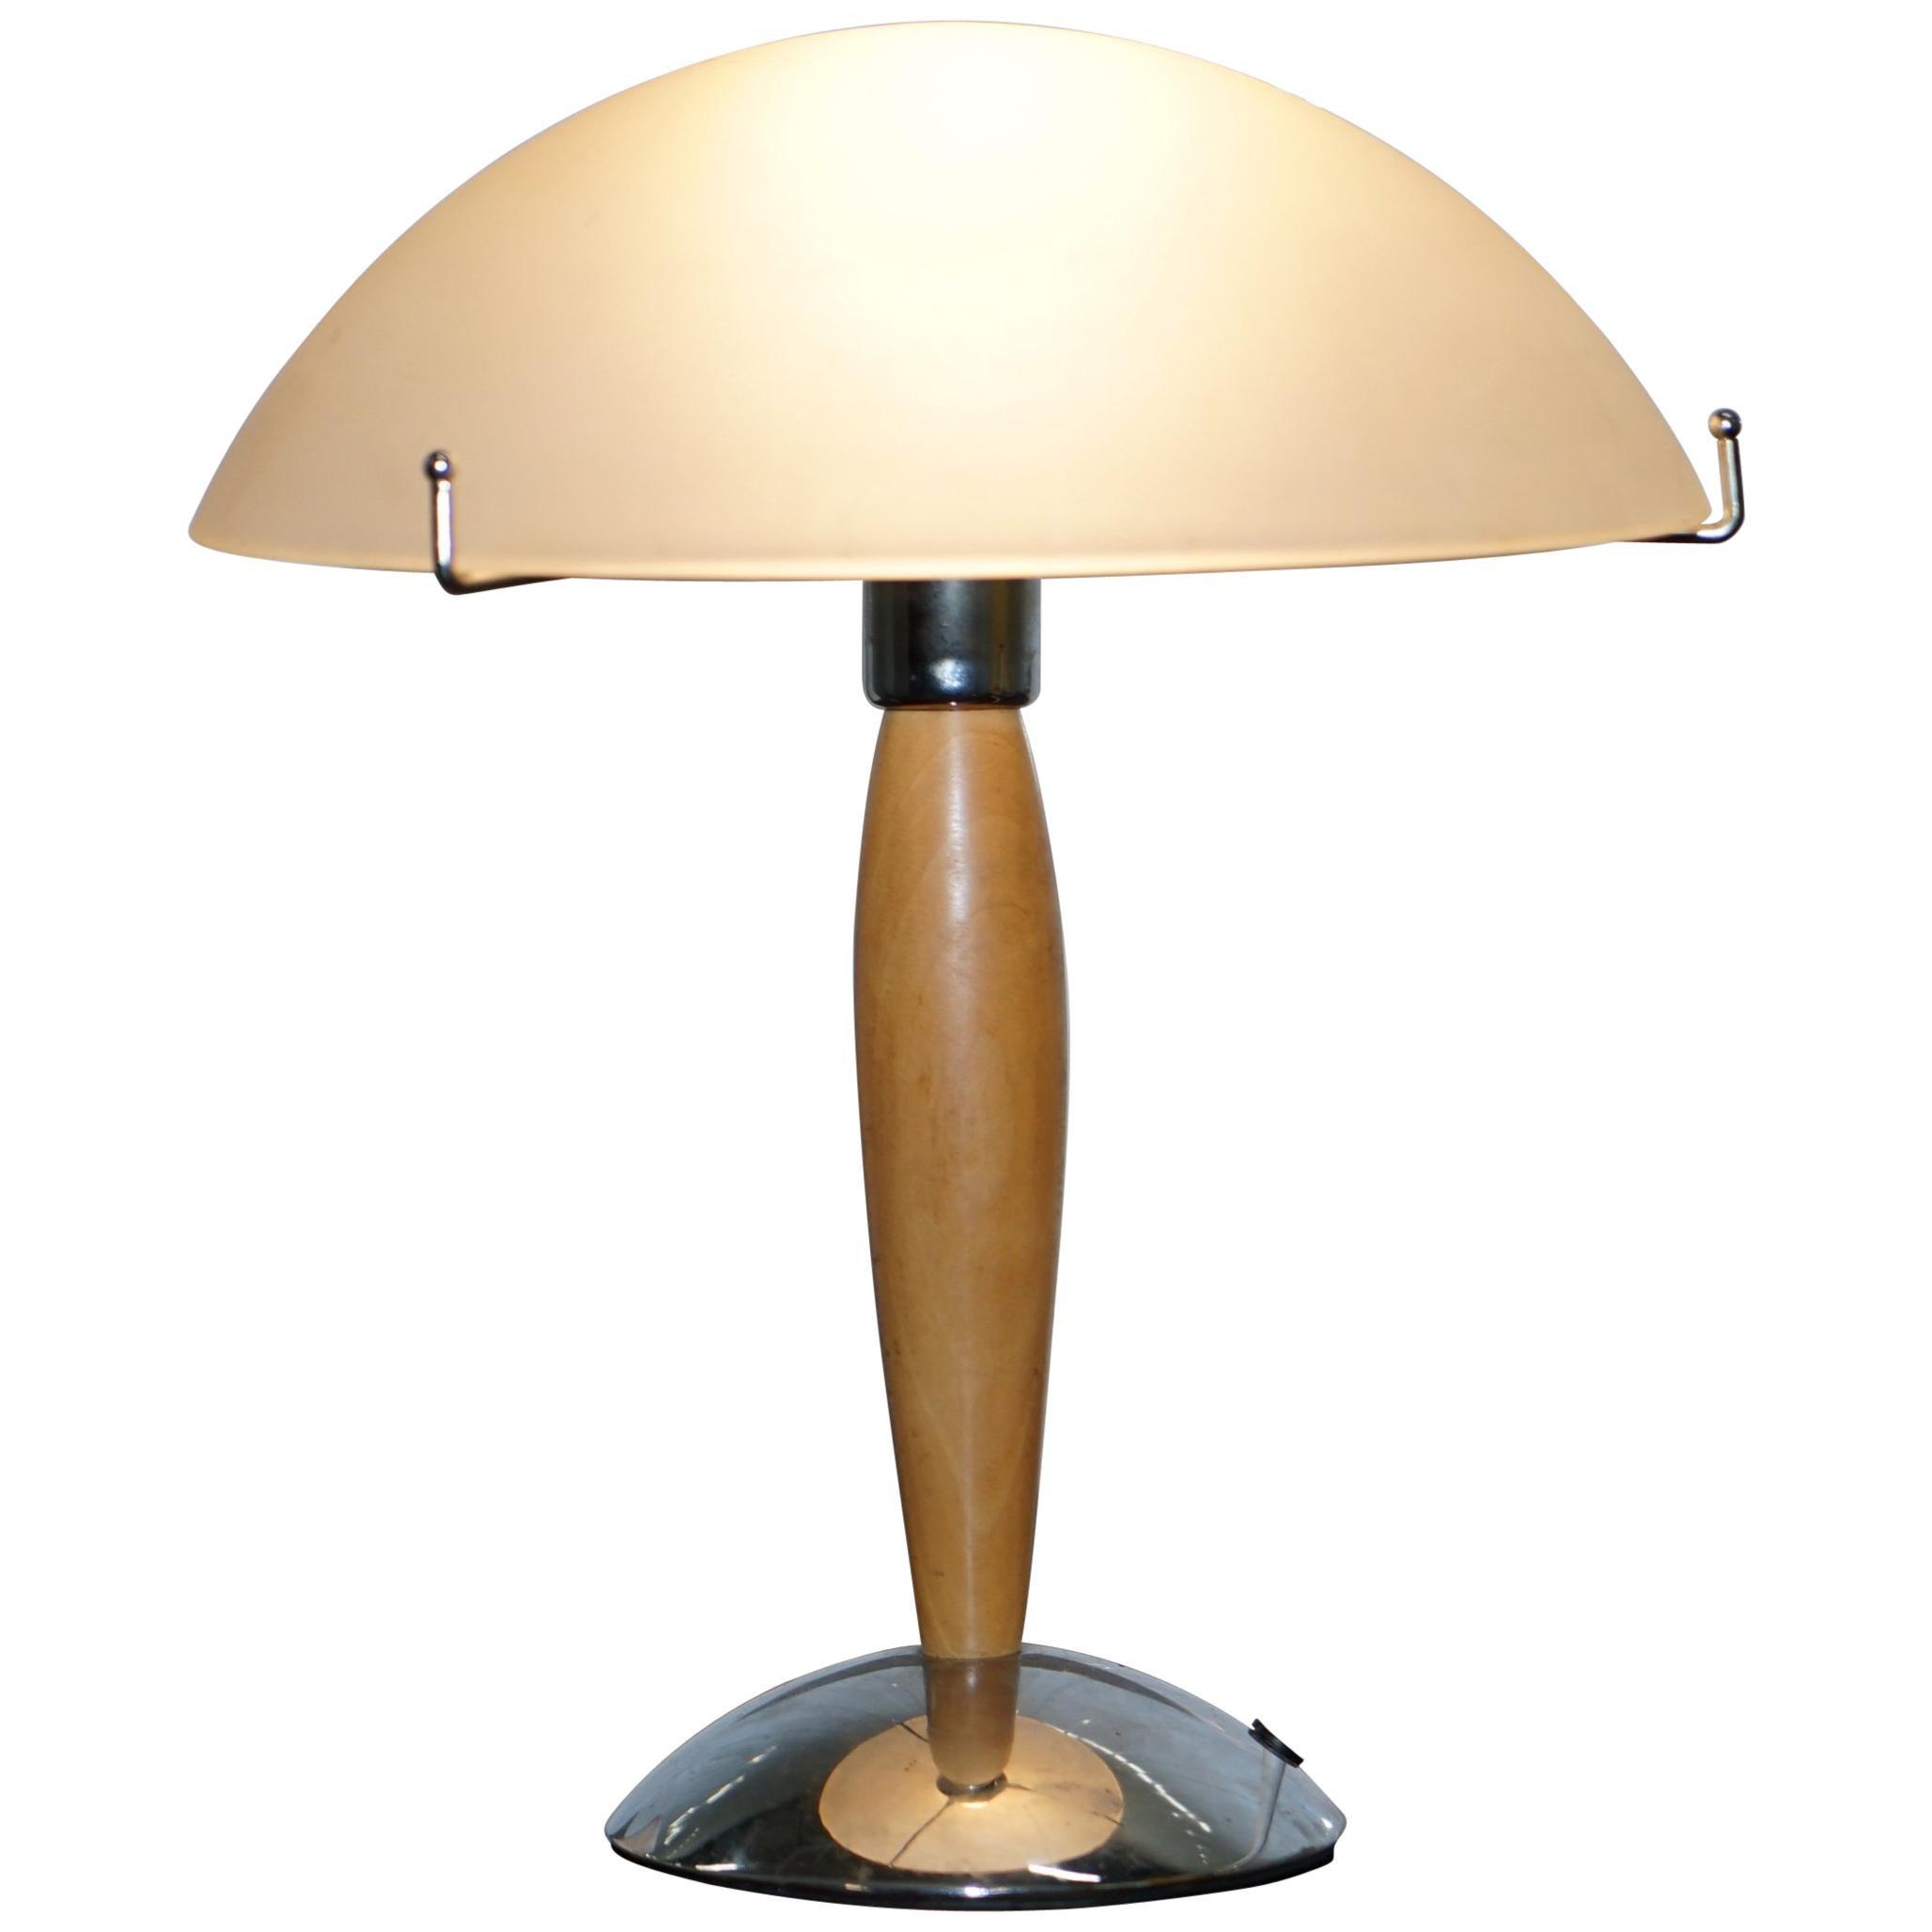 Enjoyable 1960 Rare Stilnovo Industrial Table Lamp Rewired Ready To Go Retro Wiring Digital Resources Nekoutcompassionincorg